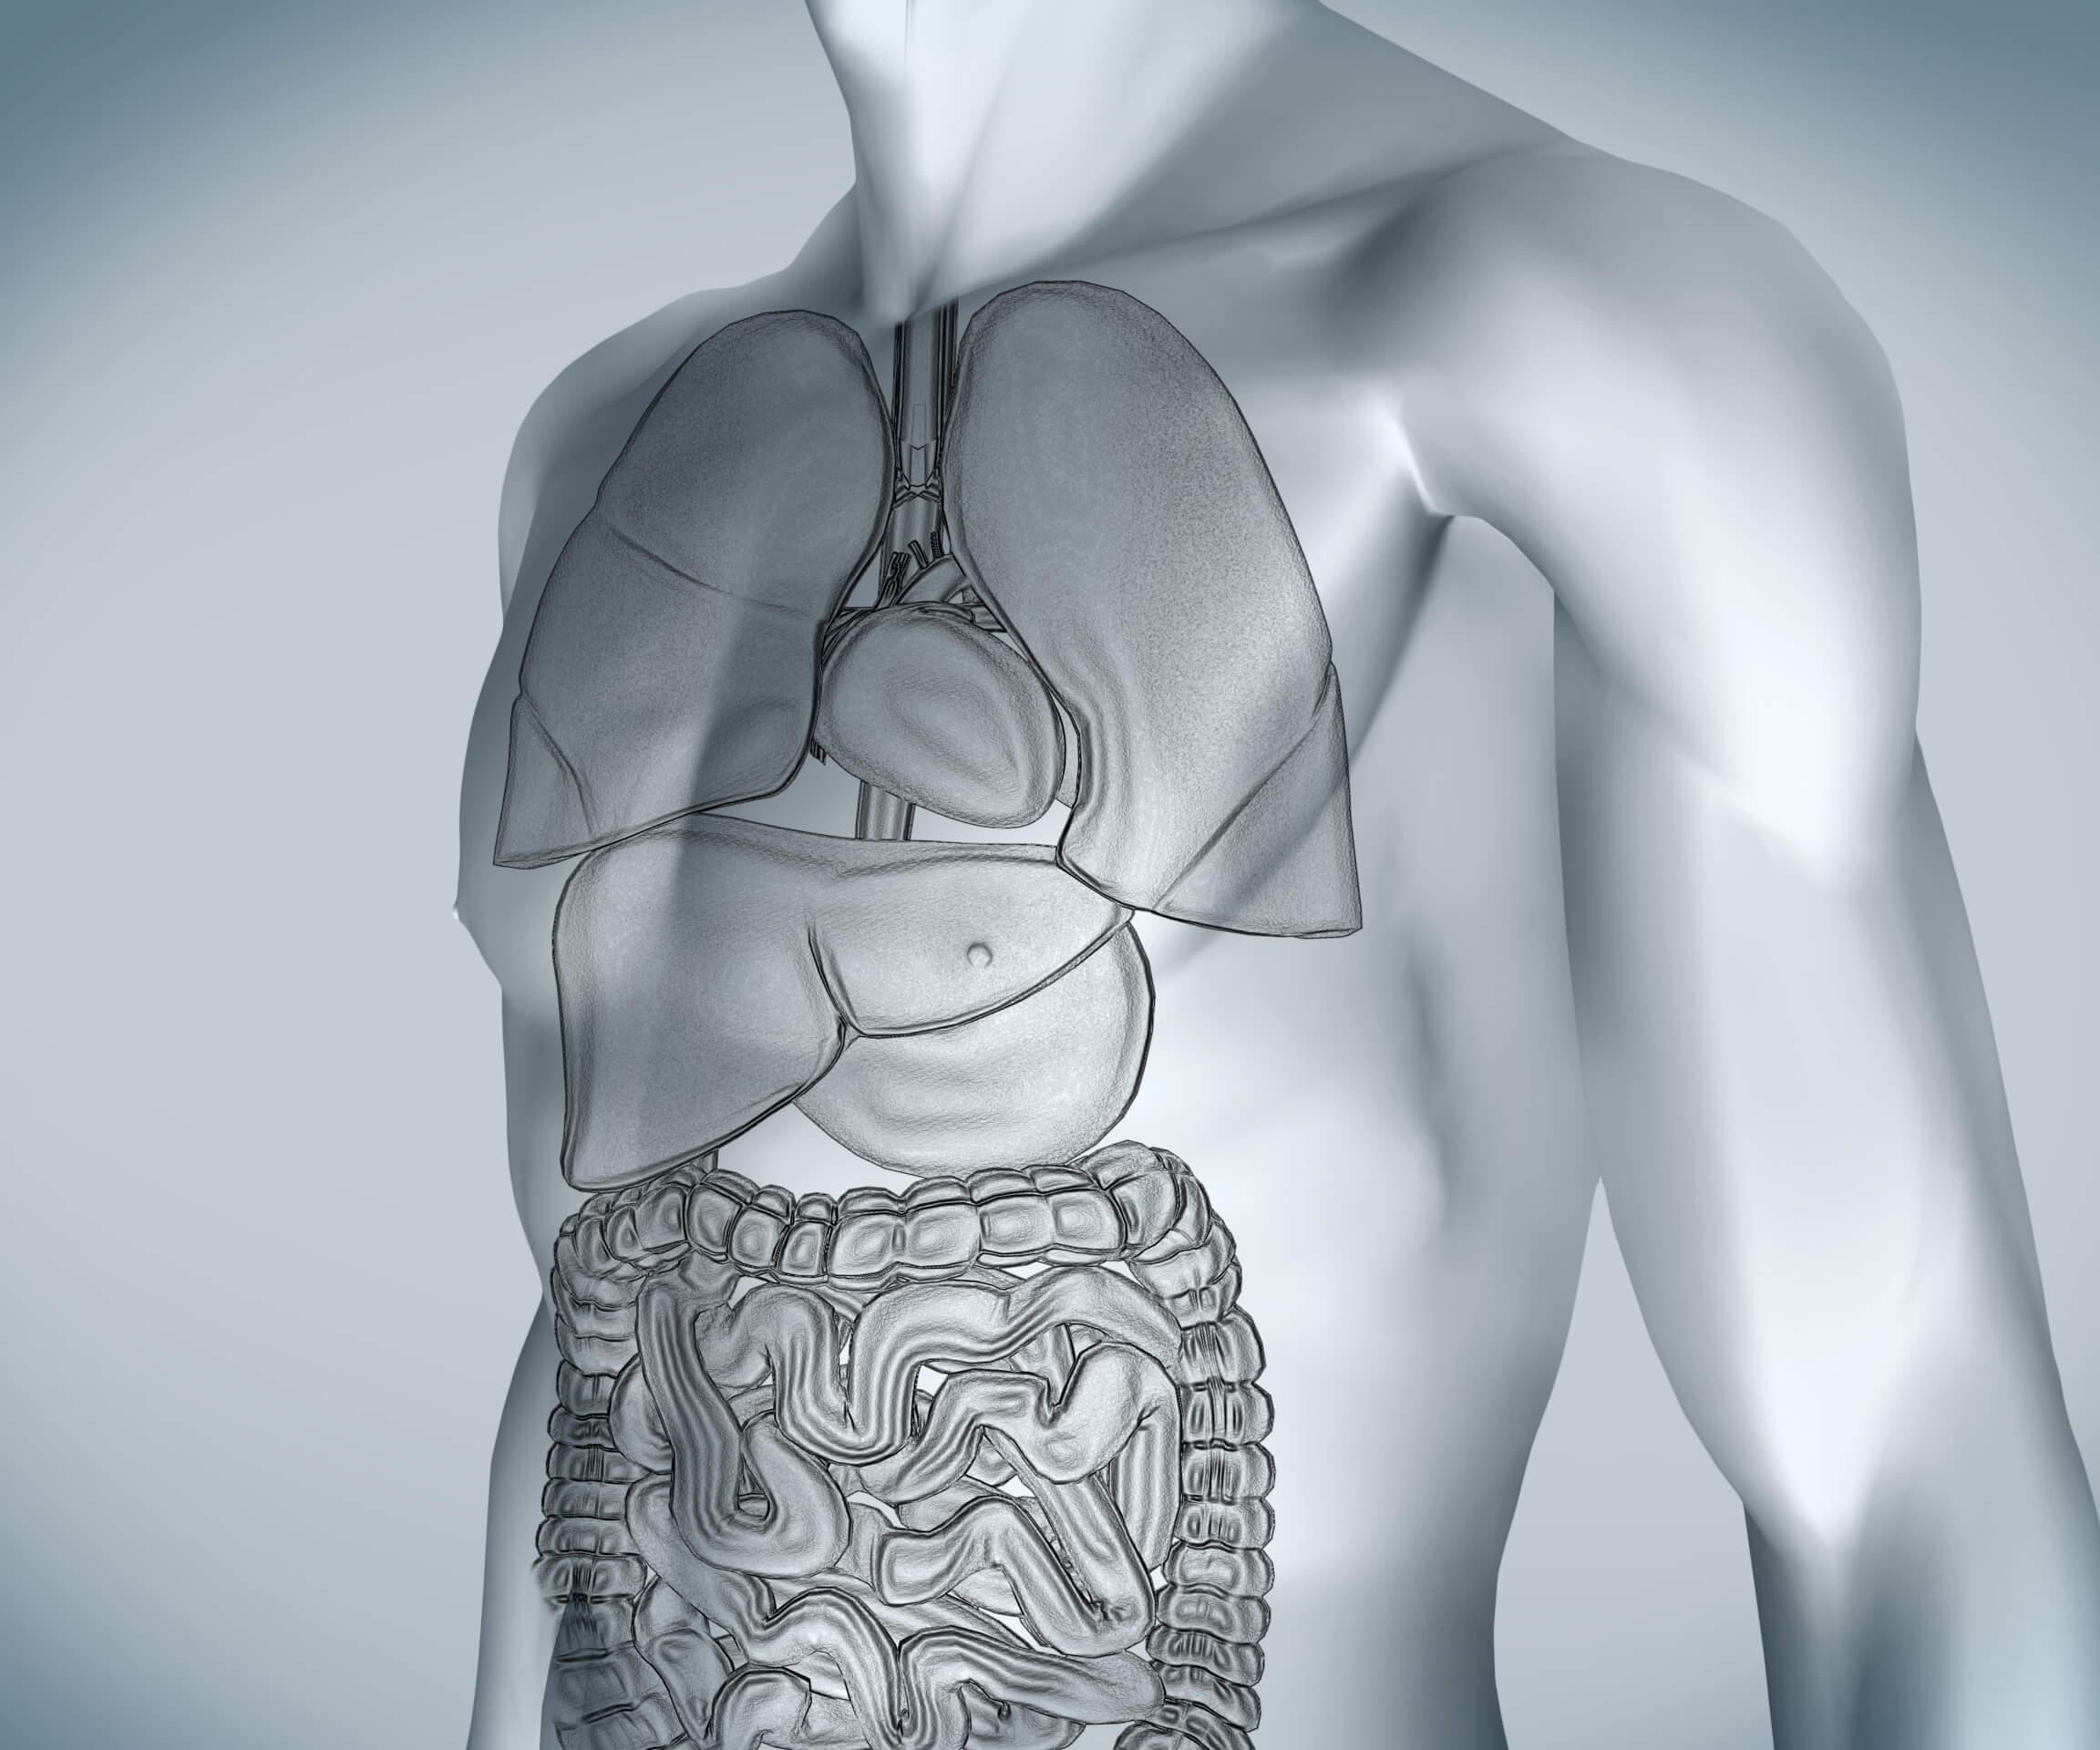 Cálculo na Vesícula: tudo que precisa saber para diagnosticar e tratar!